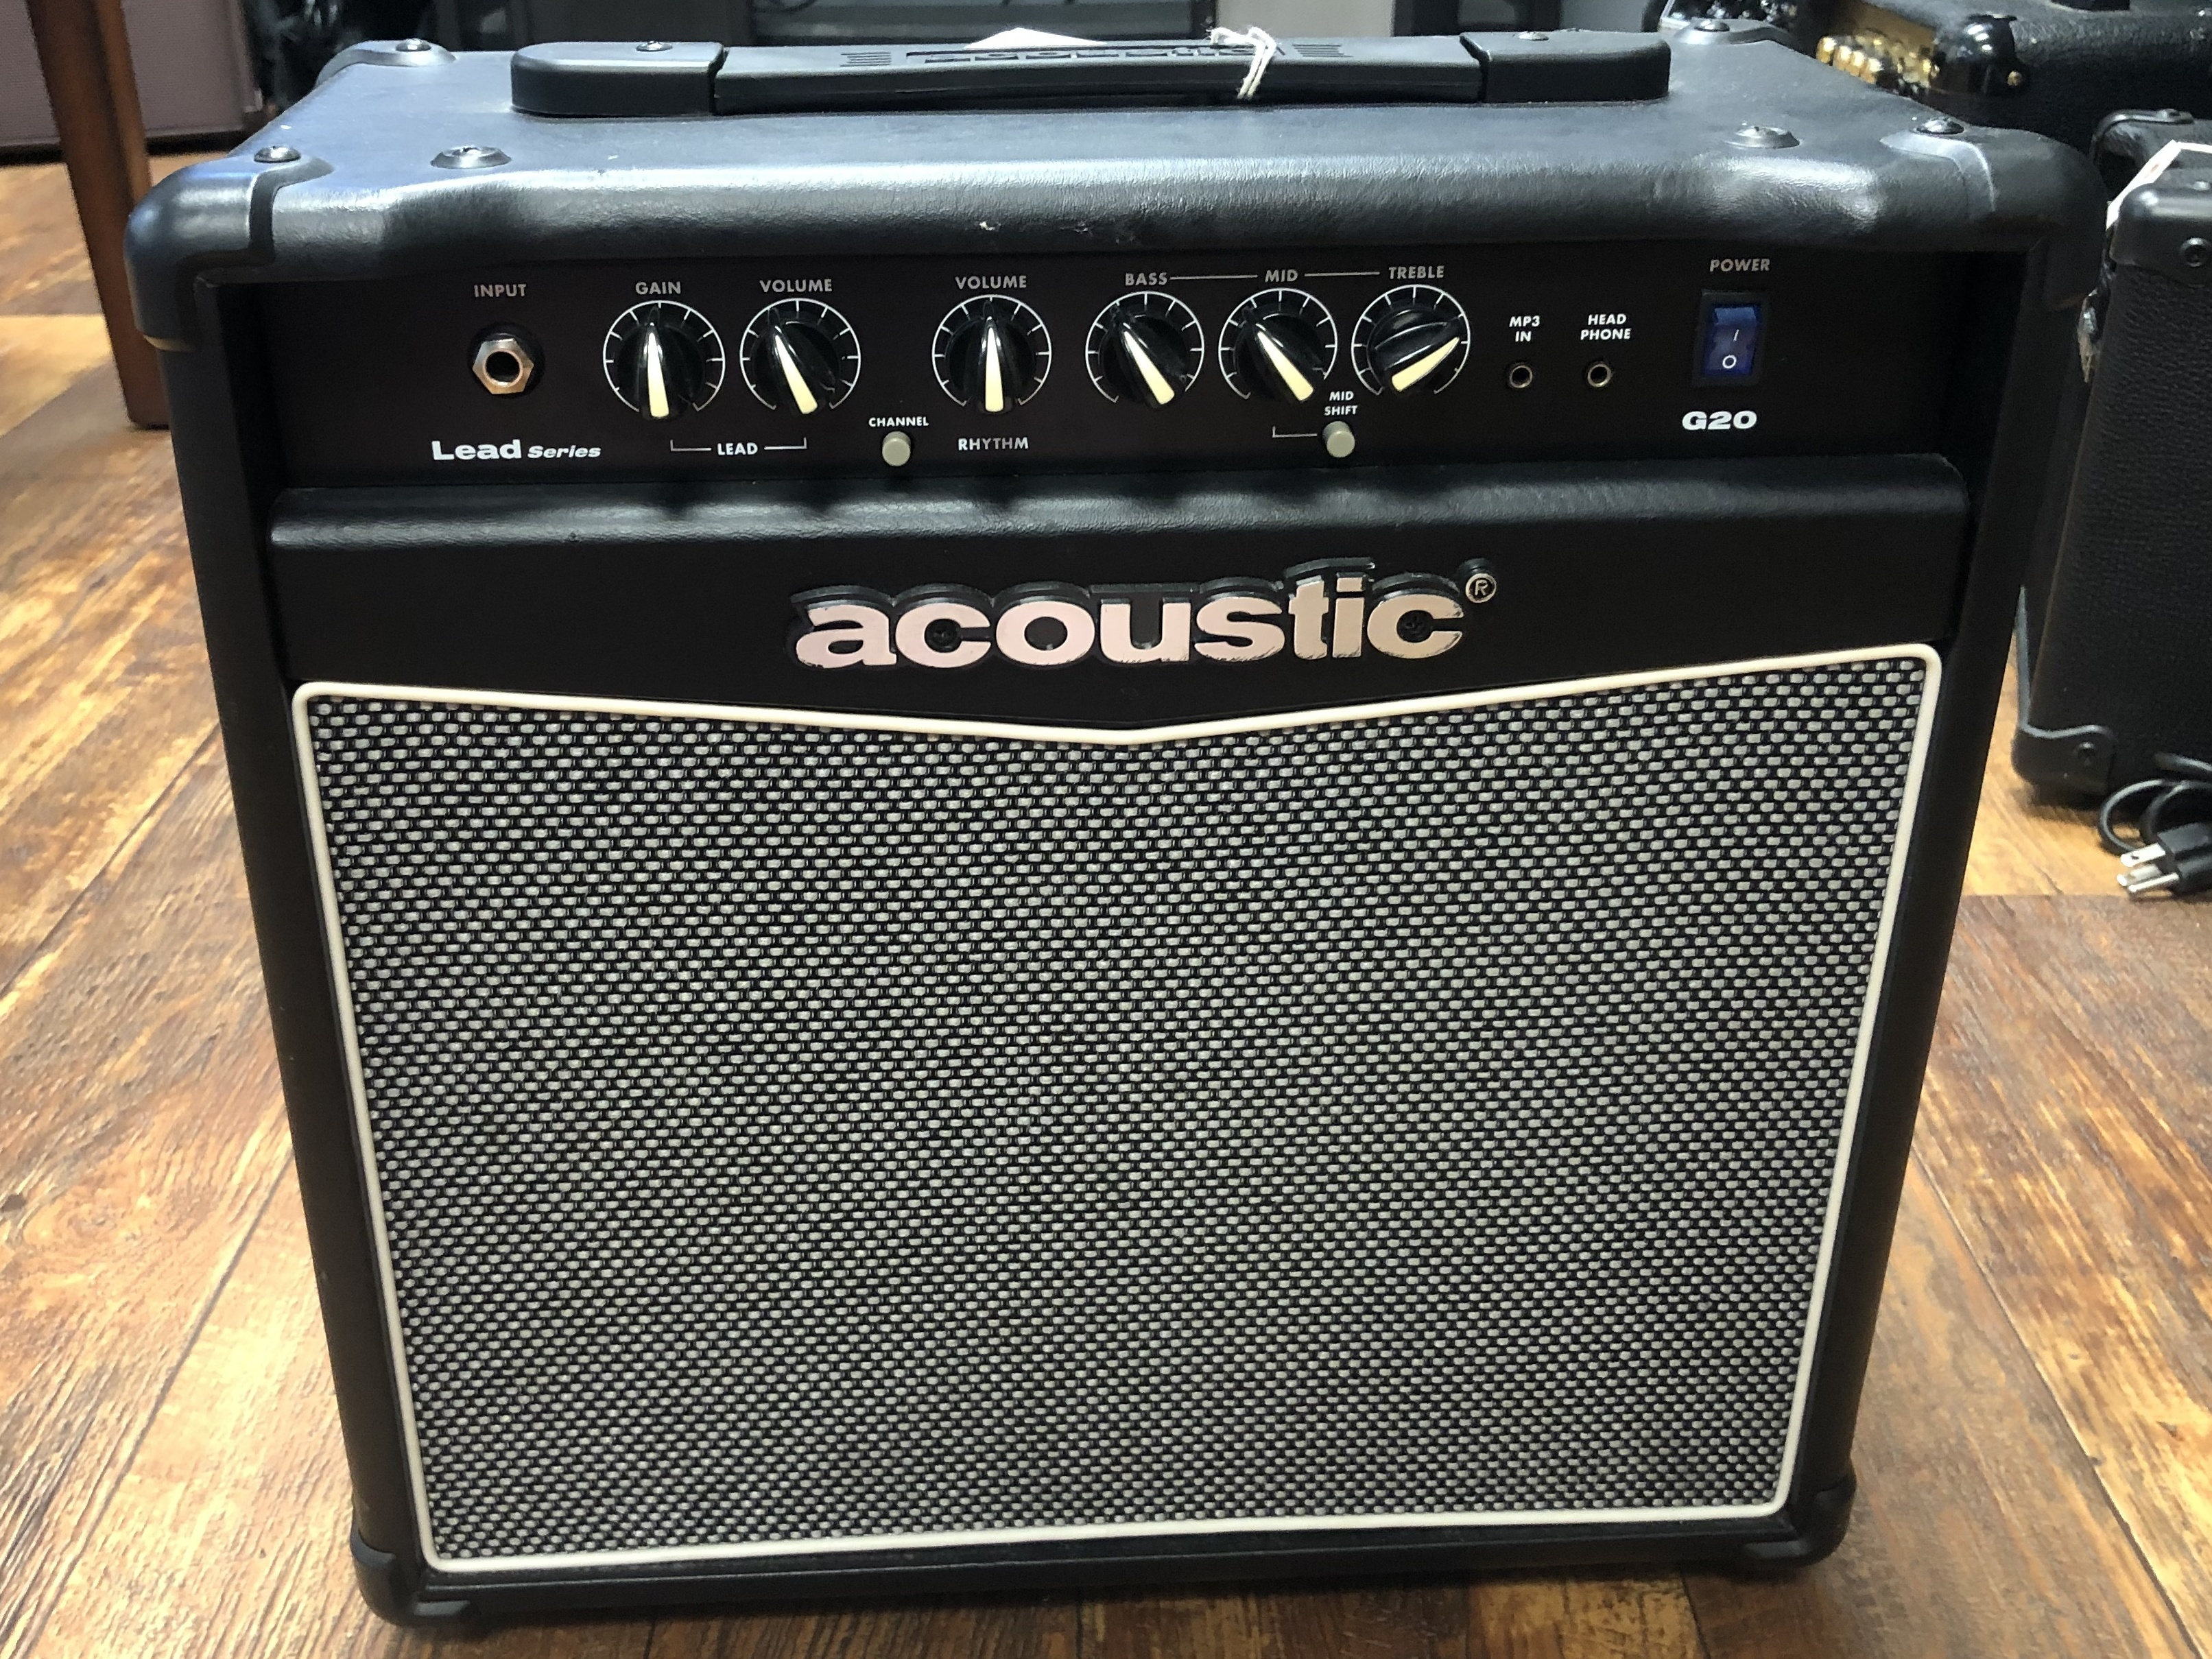 ACOUSTIC AMP - G20